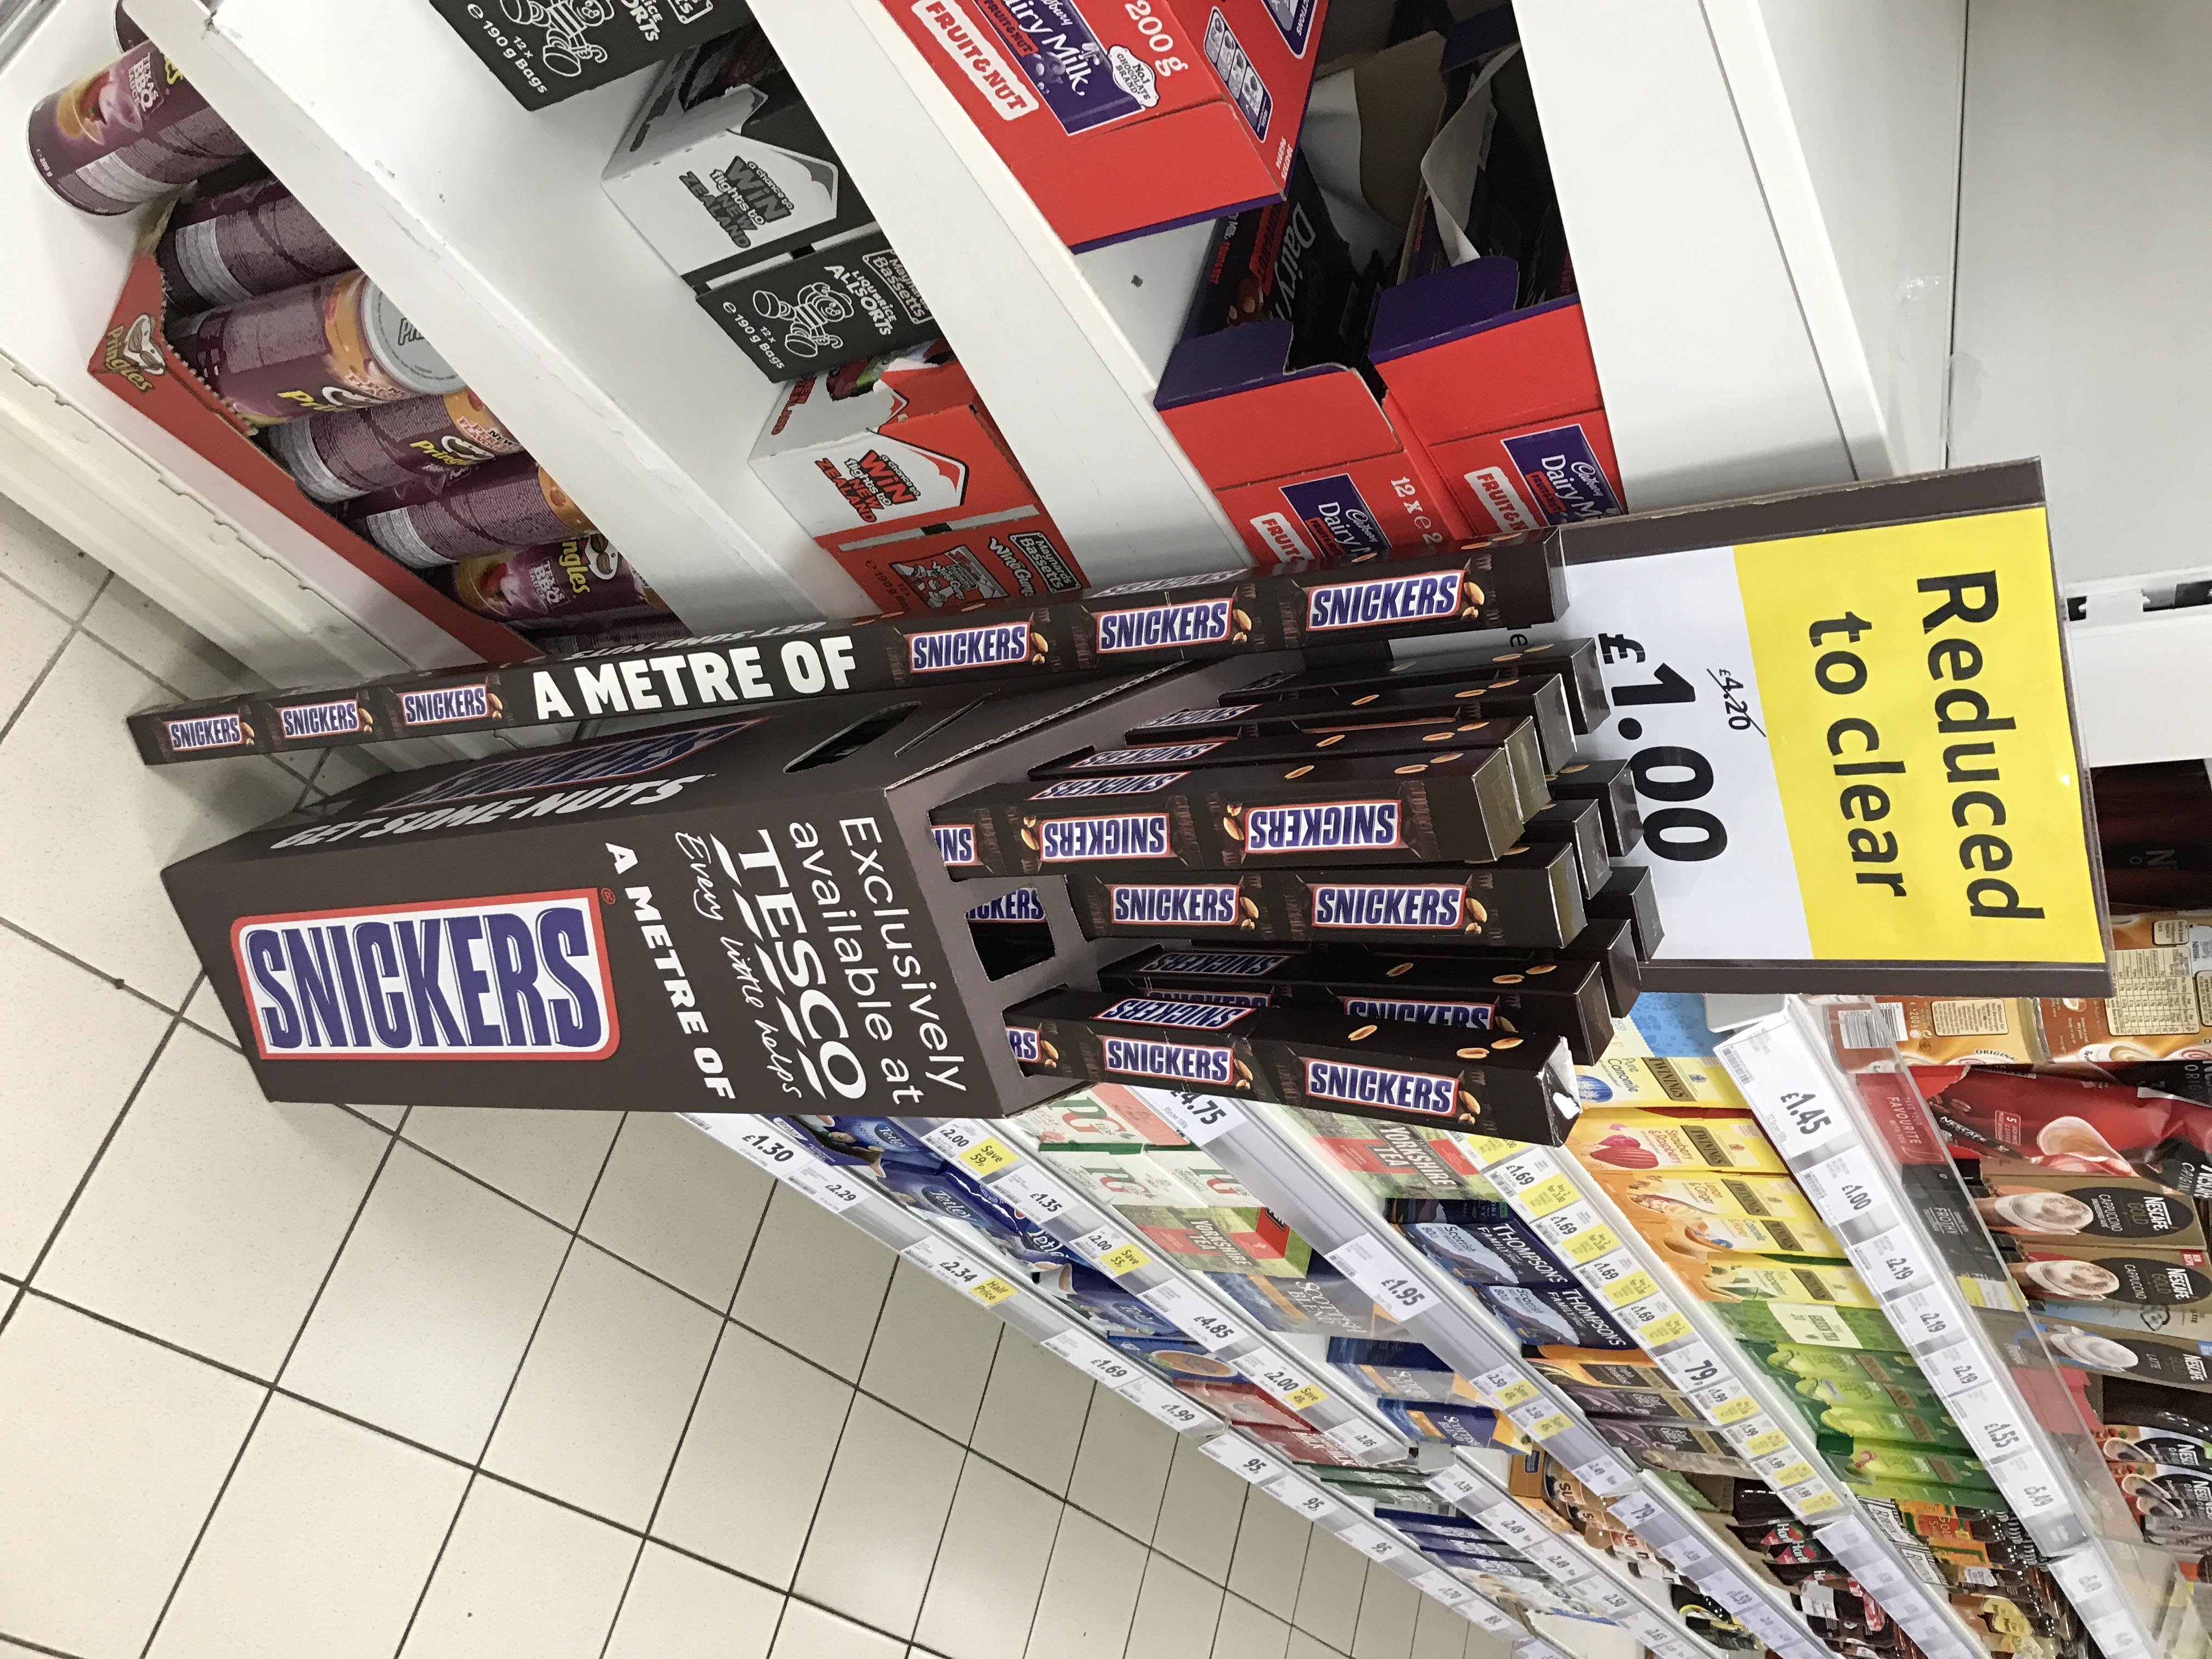 Snickers bars 1 metre long £1 @ Tesco